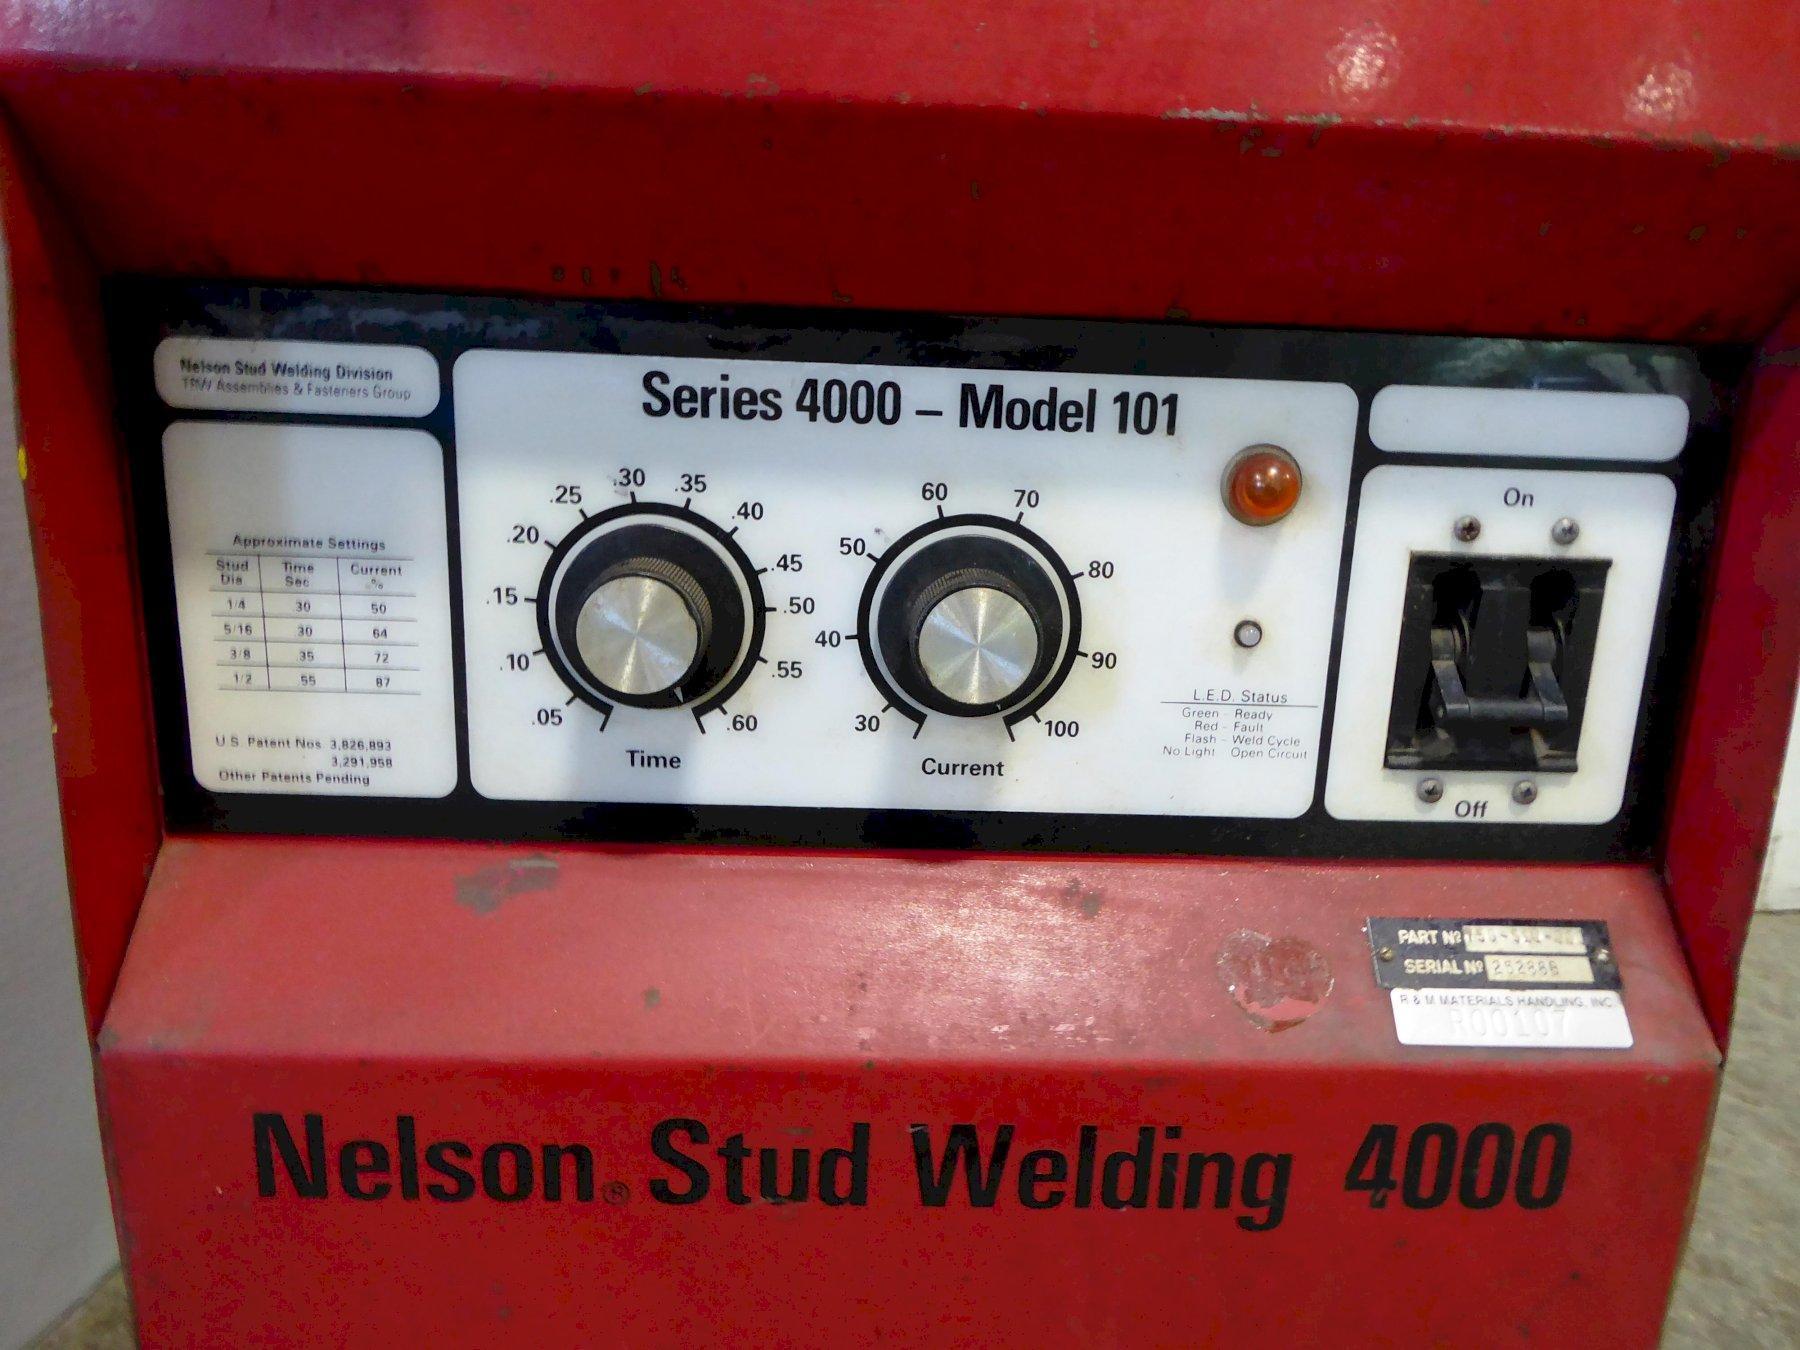 Nelson Stud Welder Series 4000 Model 101, Part No. 750-510-000, Welder and cables, No gun